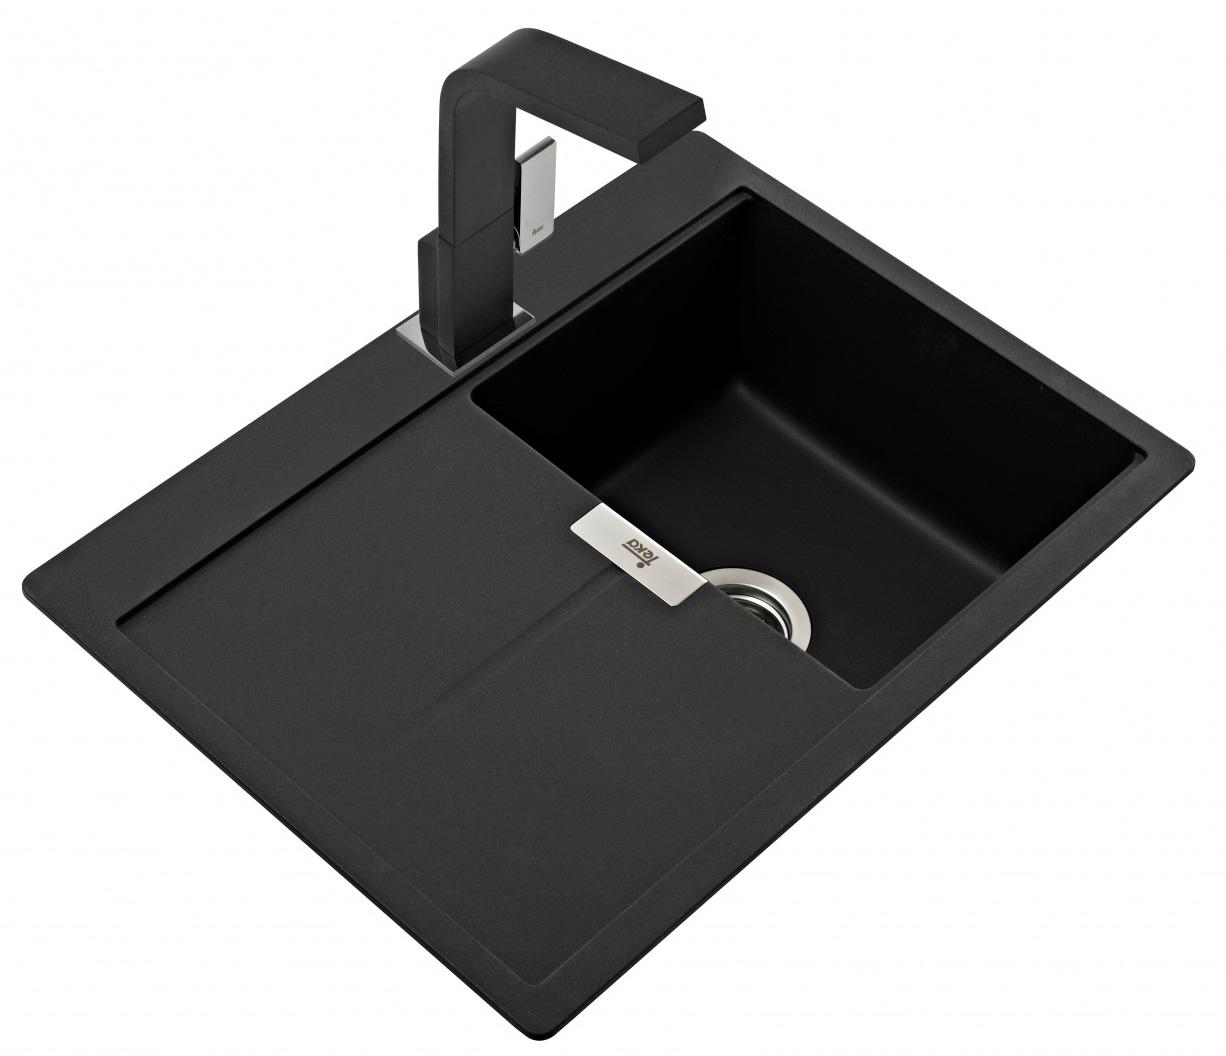 Teka Granit Einbauspüle Spüle Küchenspüle Küchen Becken ...